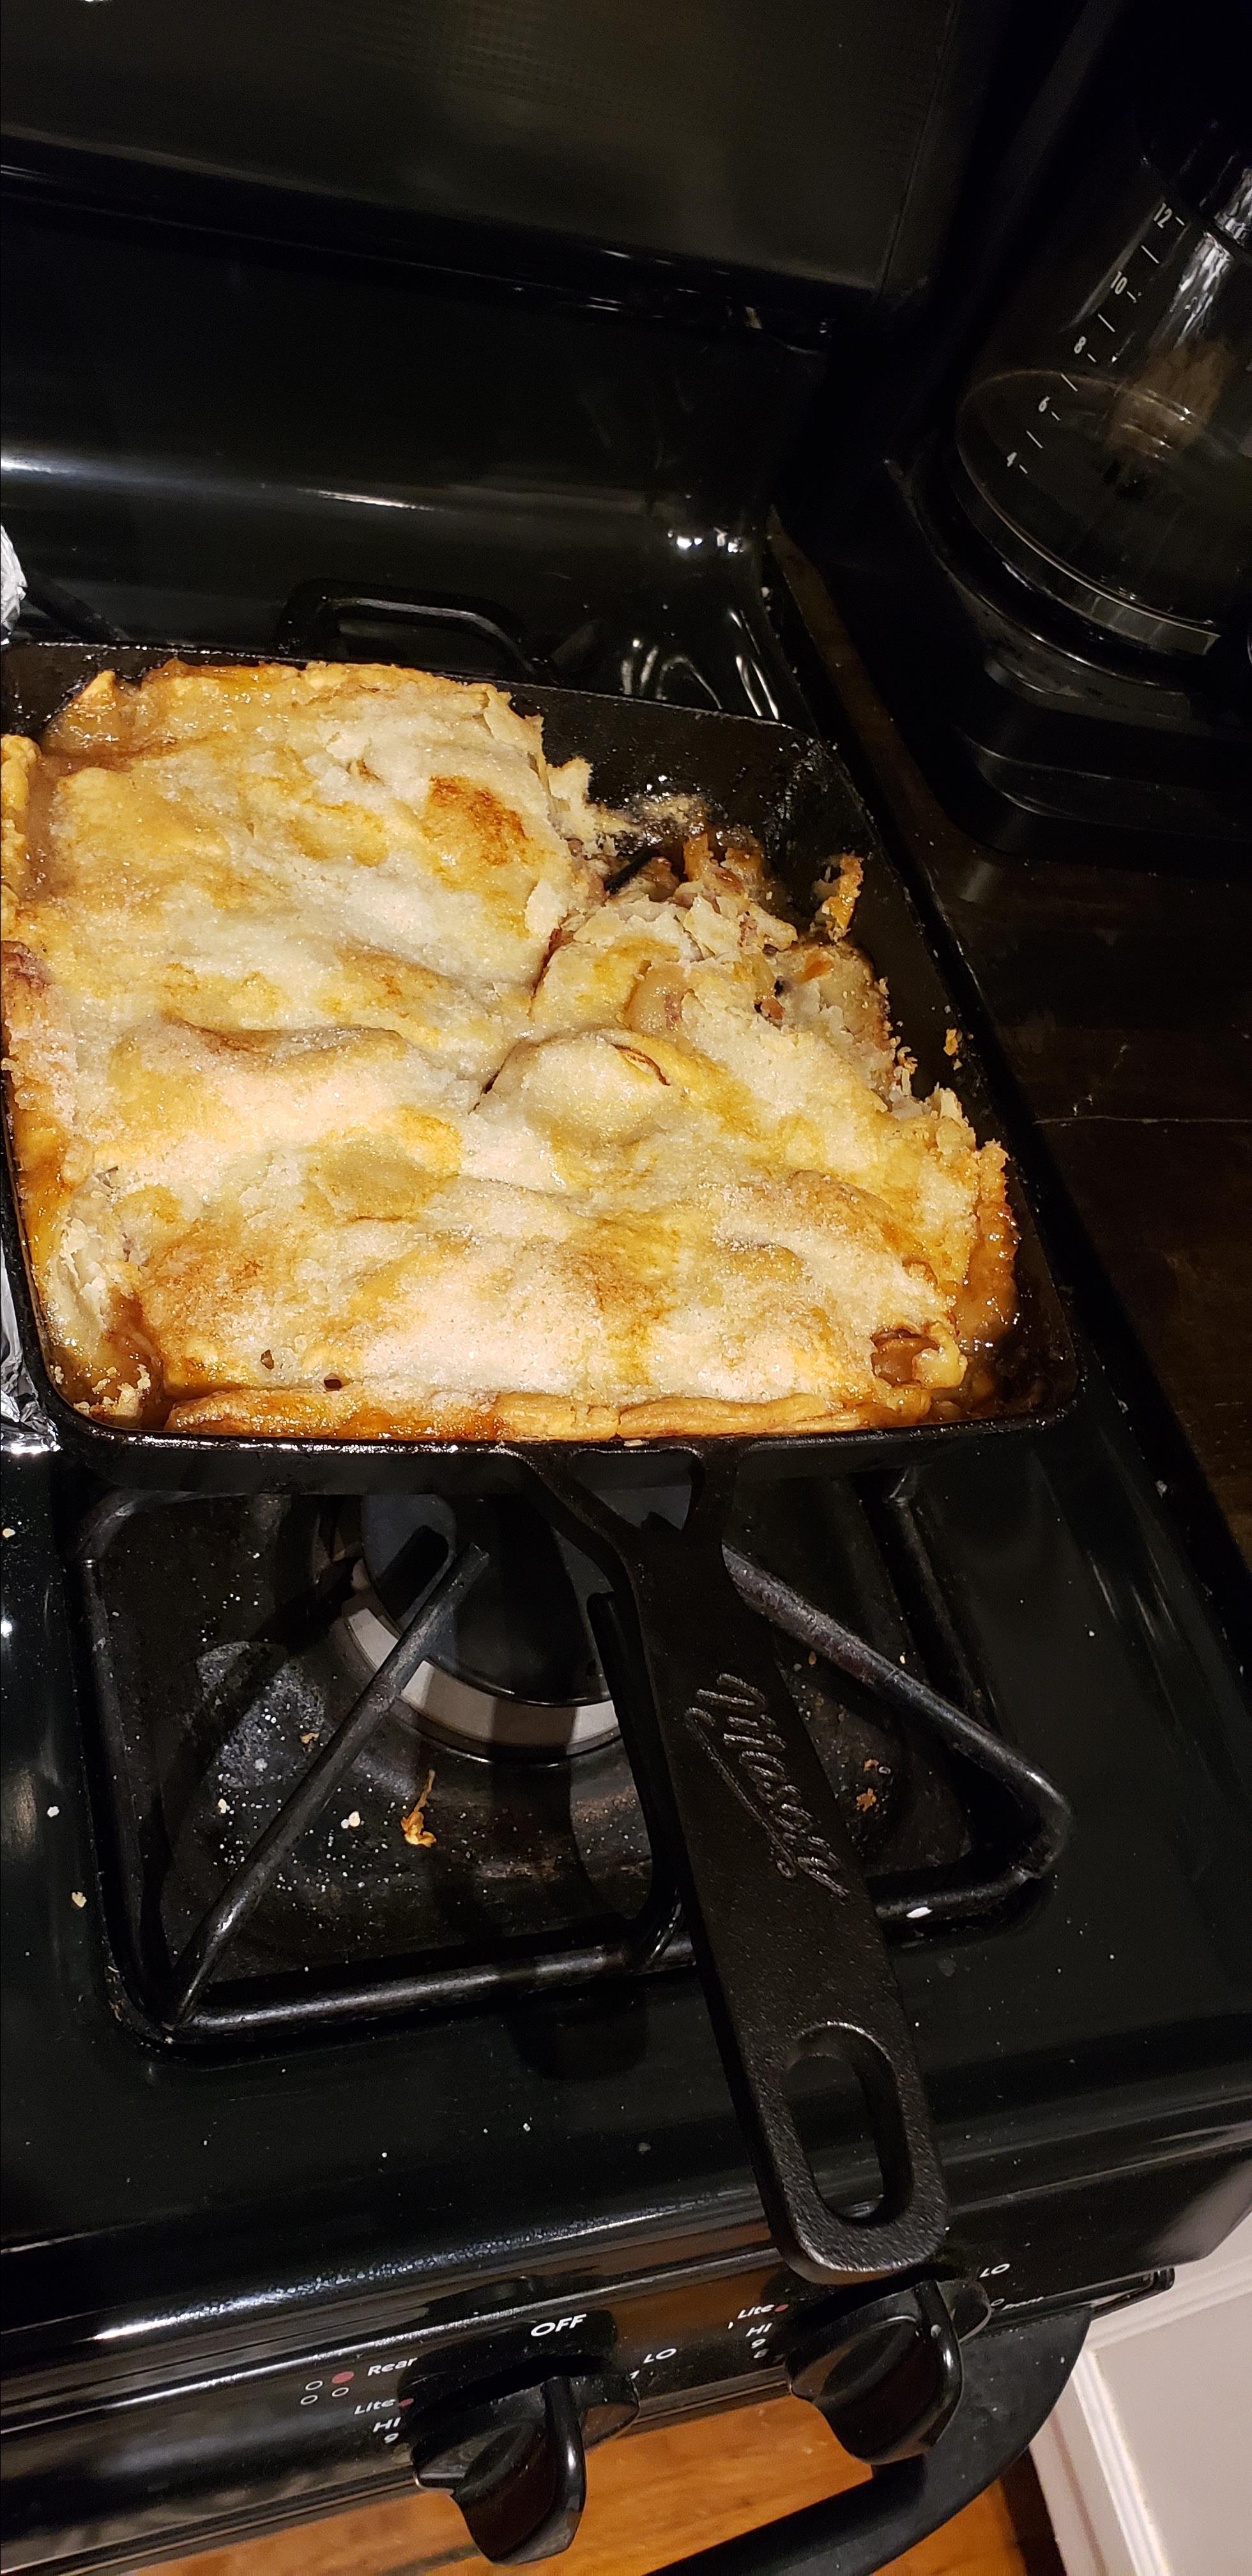 Grandma's Iron Skillet Apple Pie